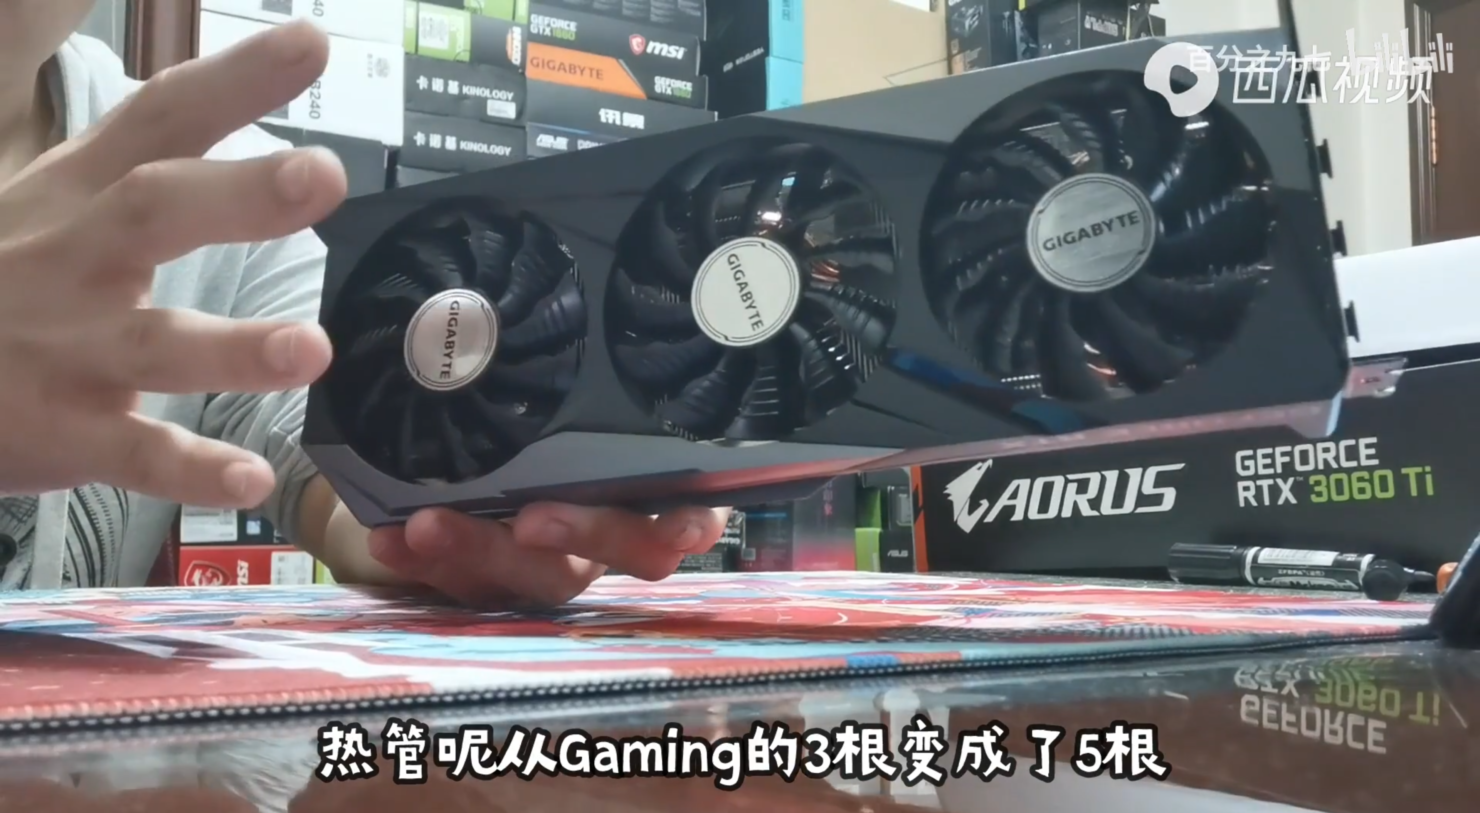 gigabyte-geforce-rtx-3060-ti-gaming-oc-pro-graphics-card_7